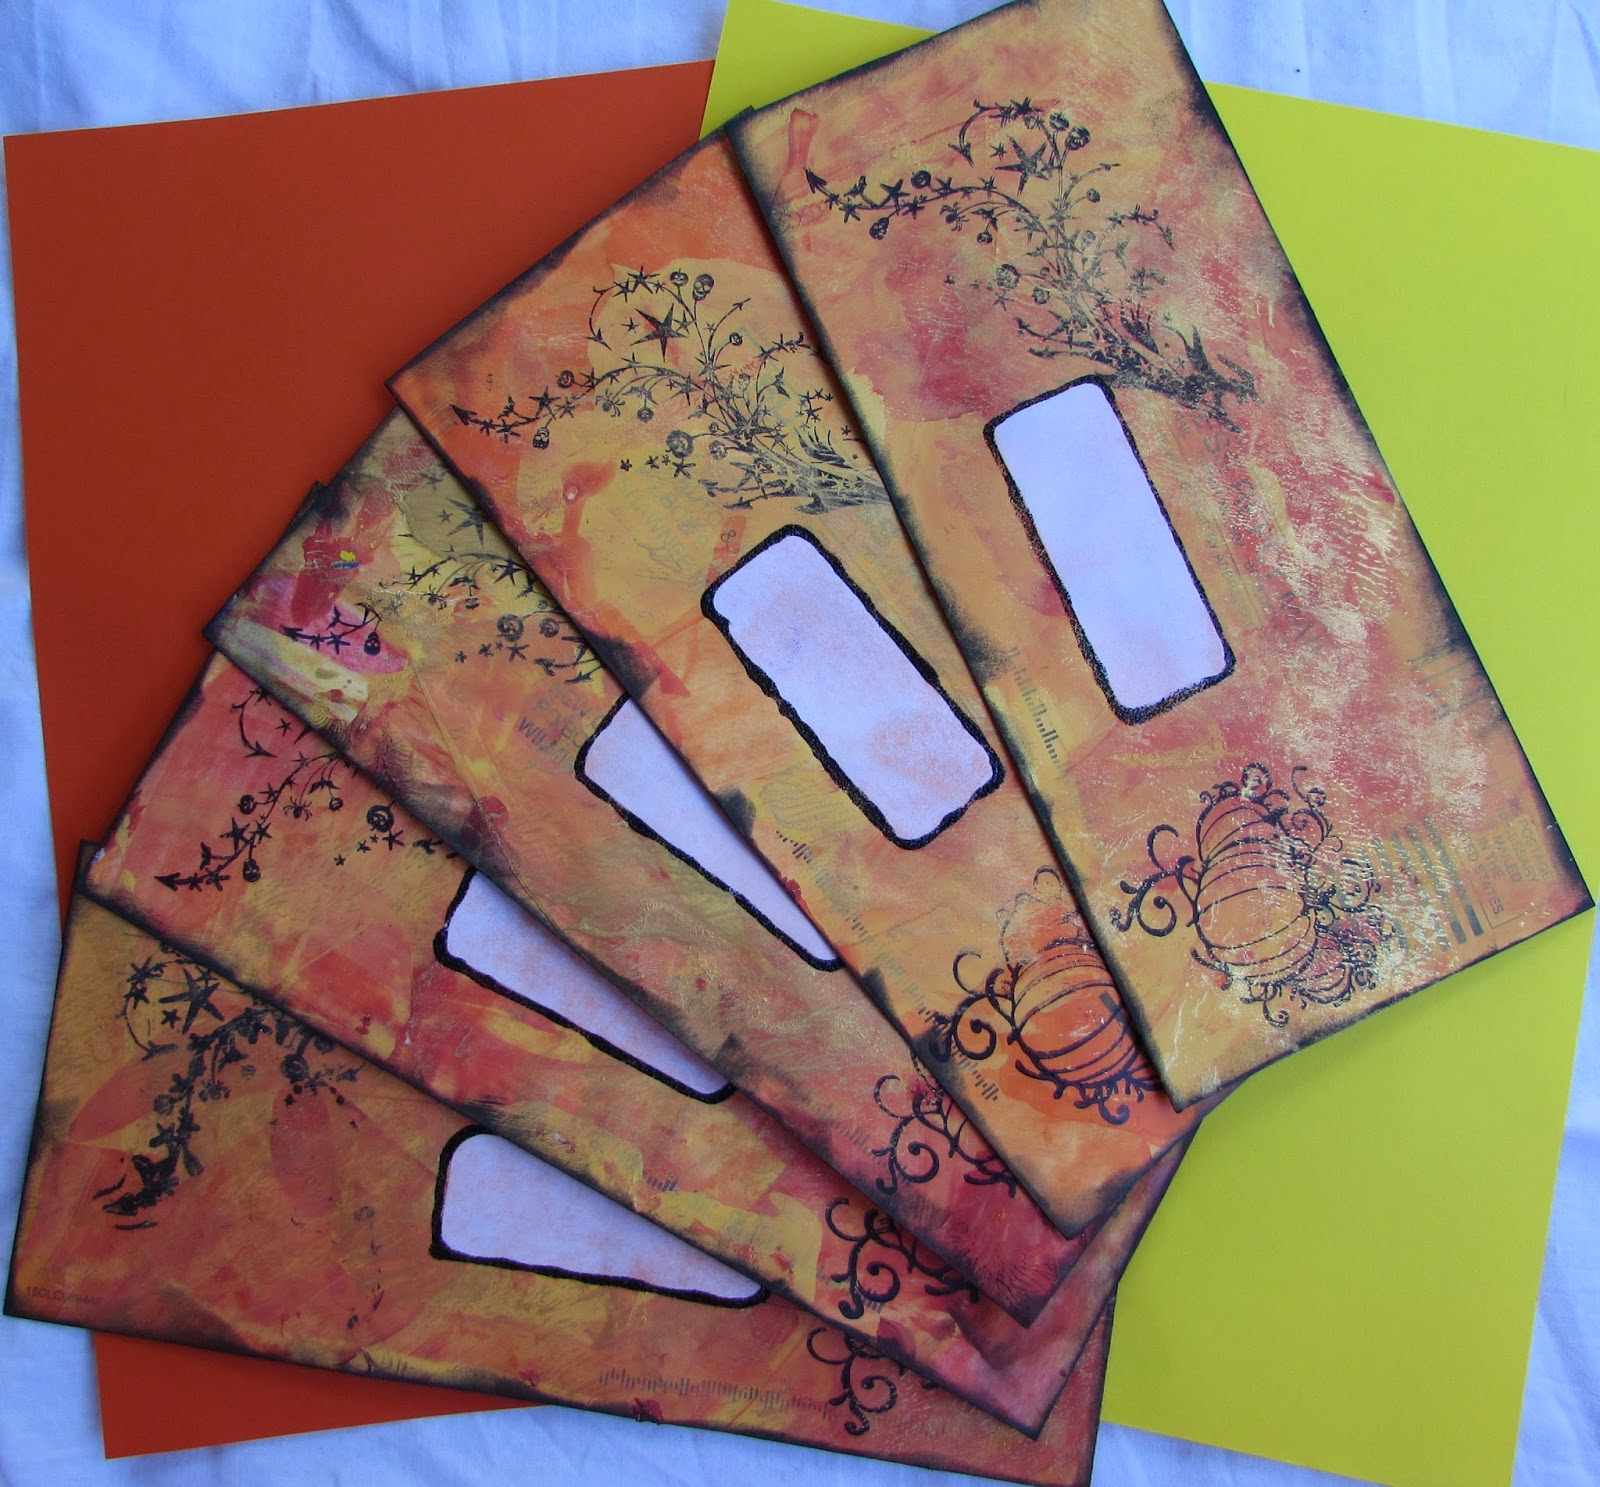 https://www.zibbet.com/enveloped-in-art/halloween-envelopes-with-writing-paper